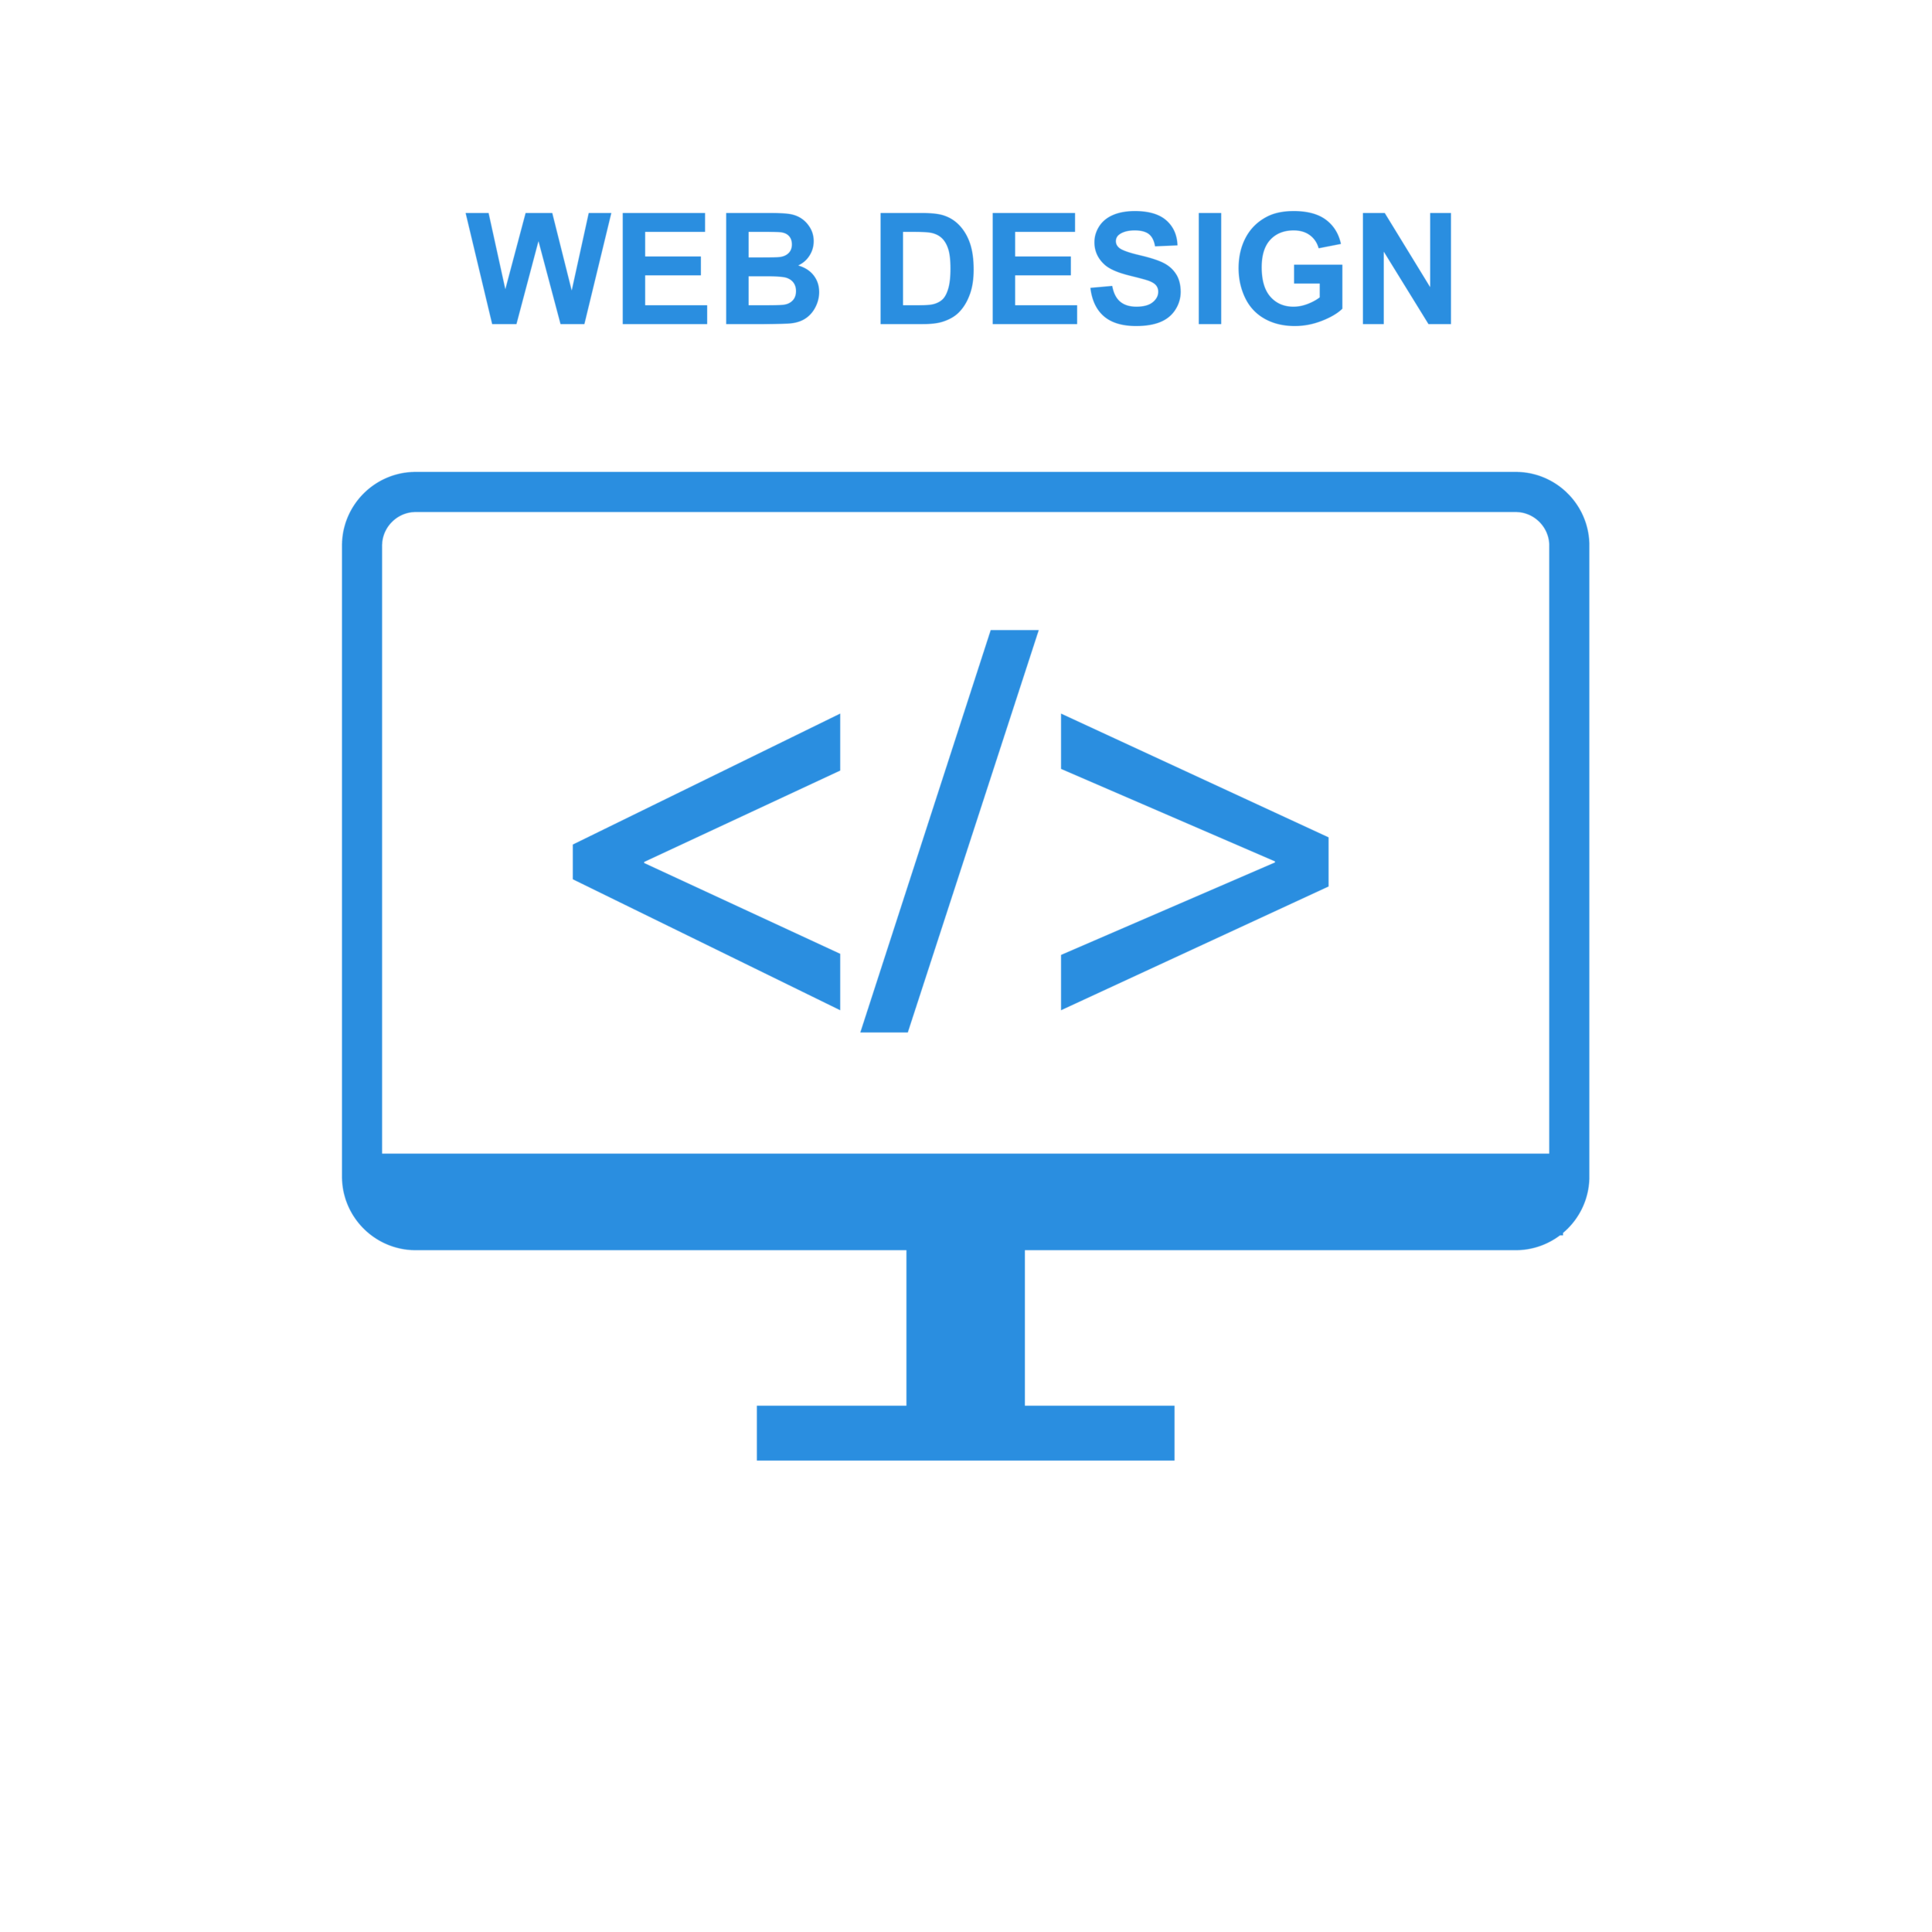 web-design-kotiadis-consulting copy.png